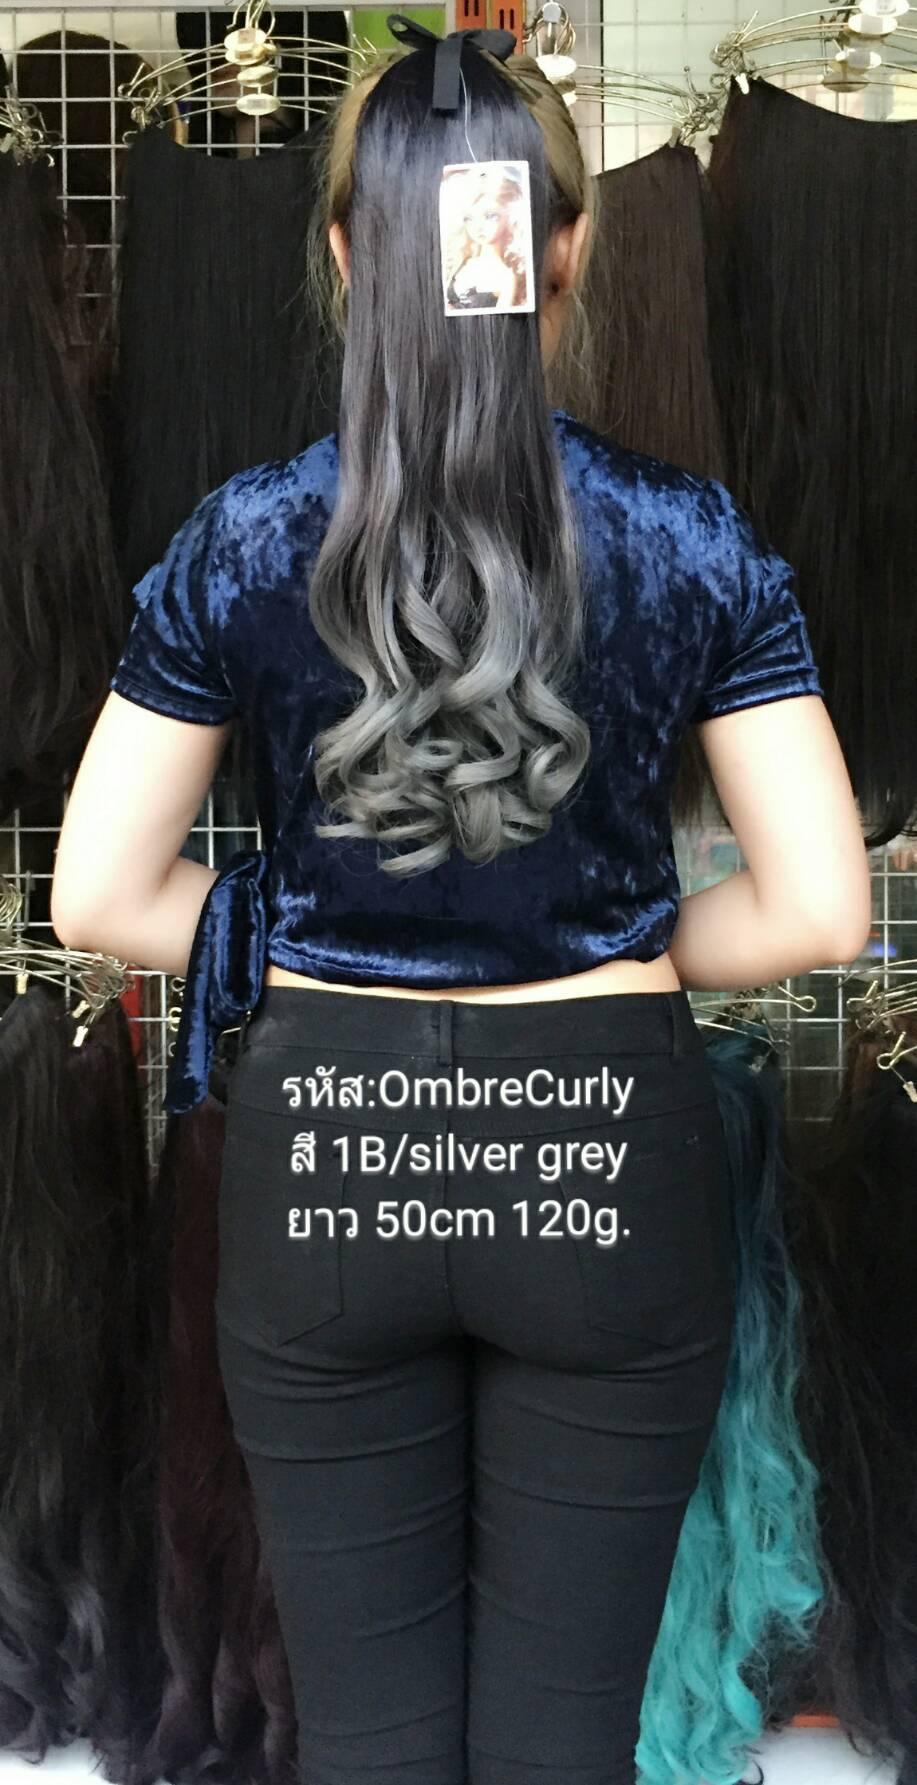 Ombre Curly Ribbon แบบลอน สี 1B/Silver Grey